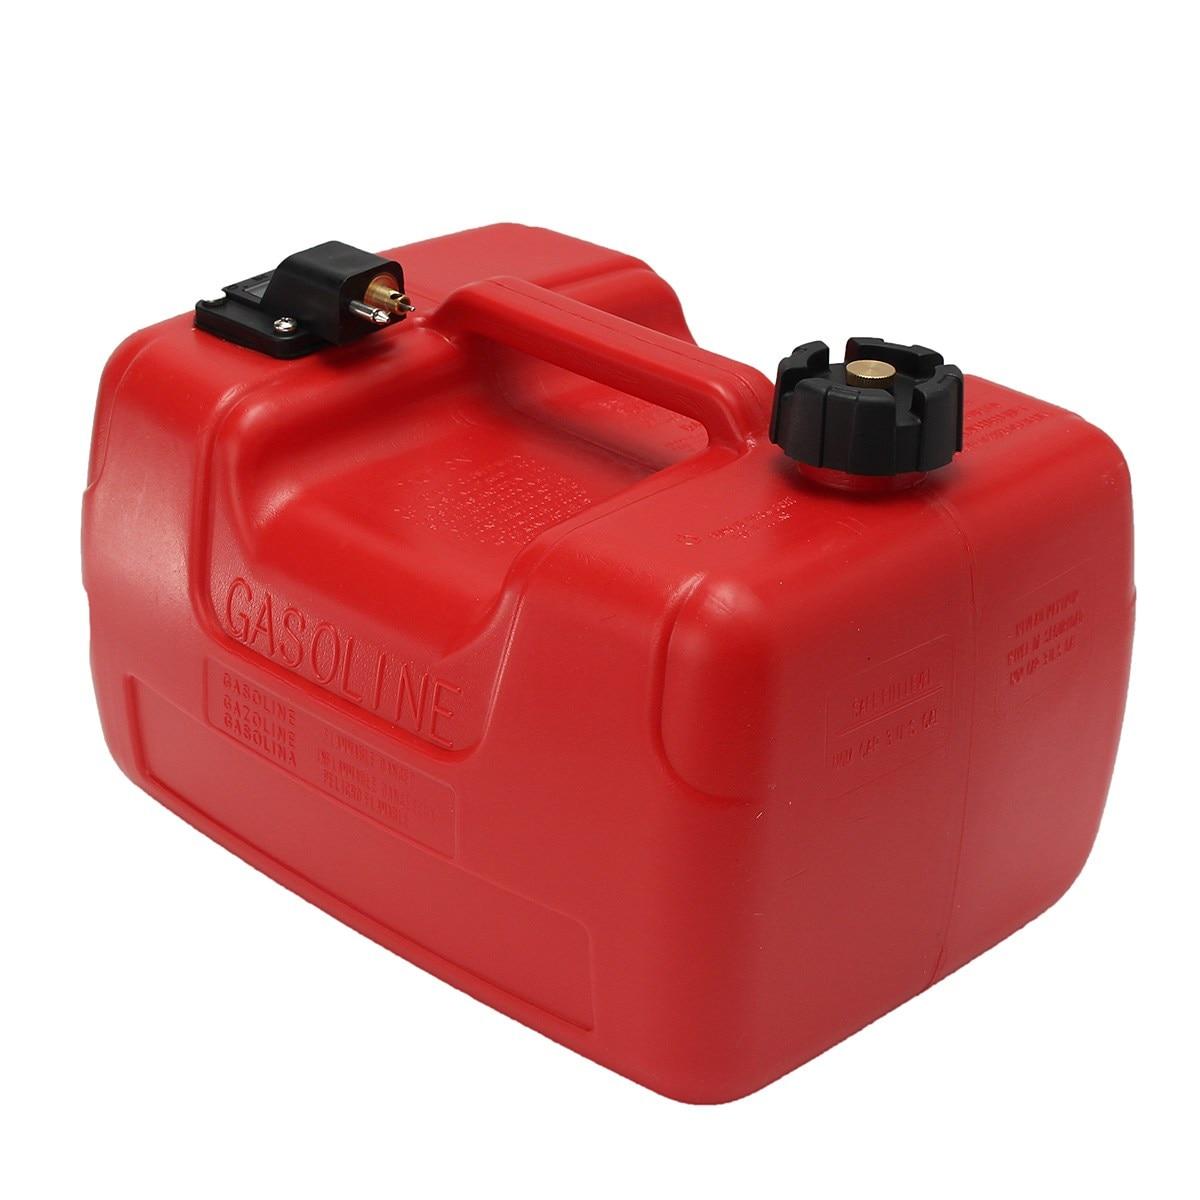 Fuel tanks for yamaha hidea hangkai outboard motor for Gas tanks for outboard motors